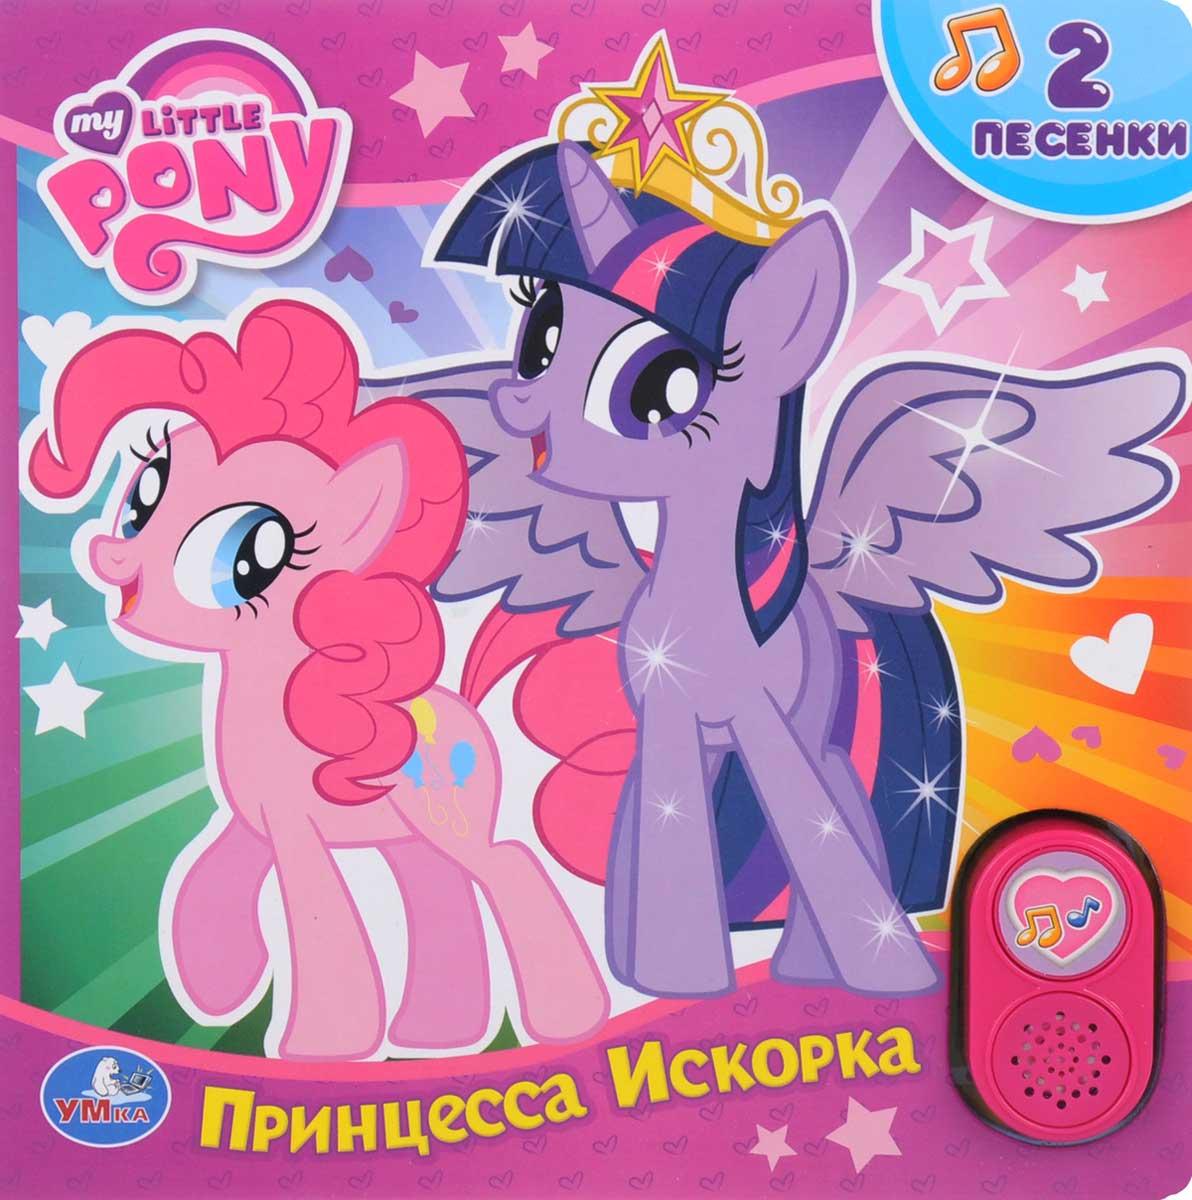 Принцесса Искорка. Книжка-игрушка принцесса и гоблины книга